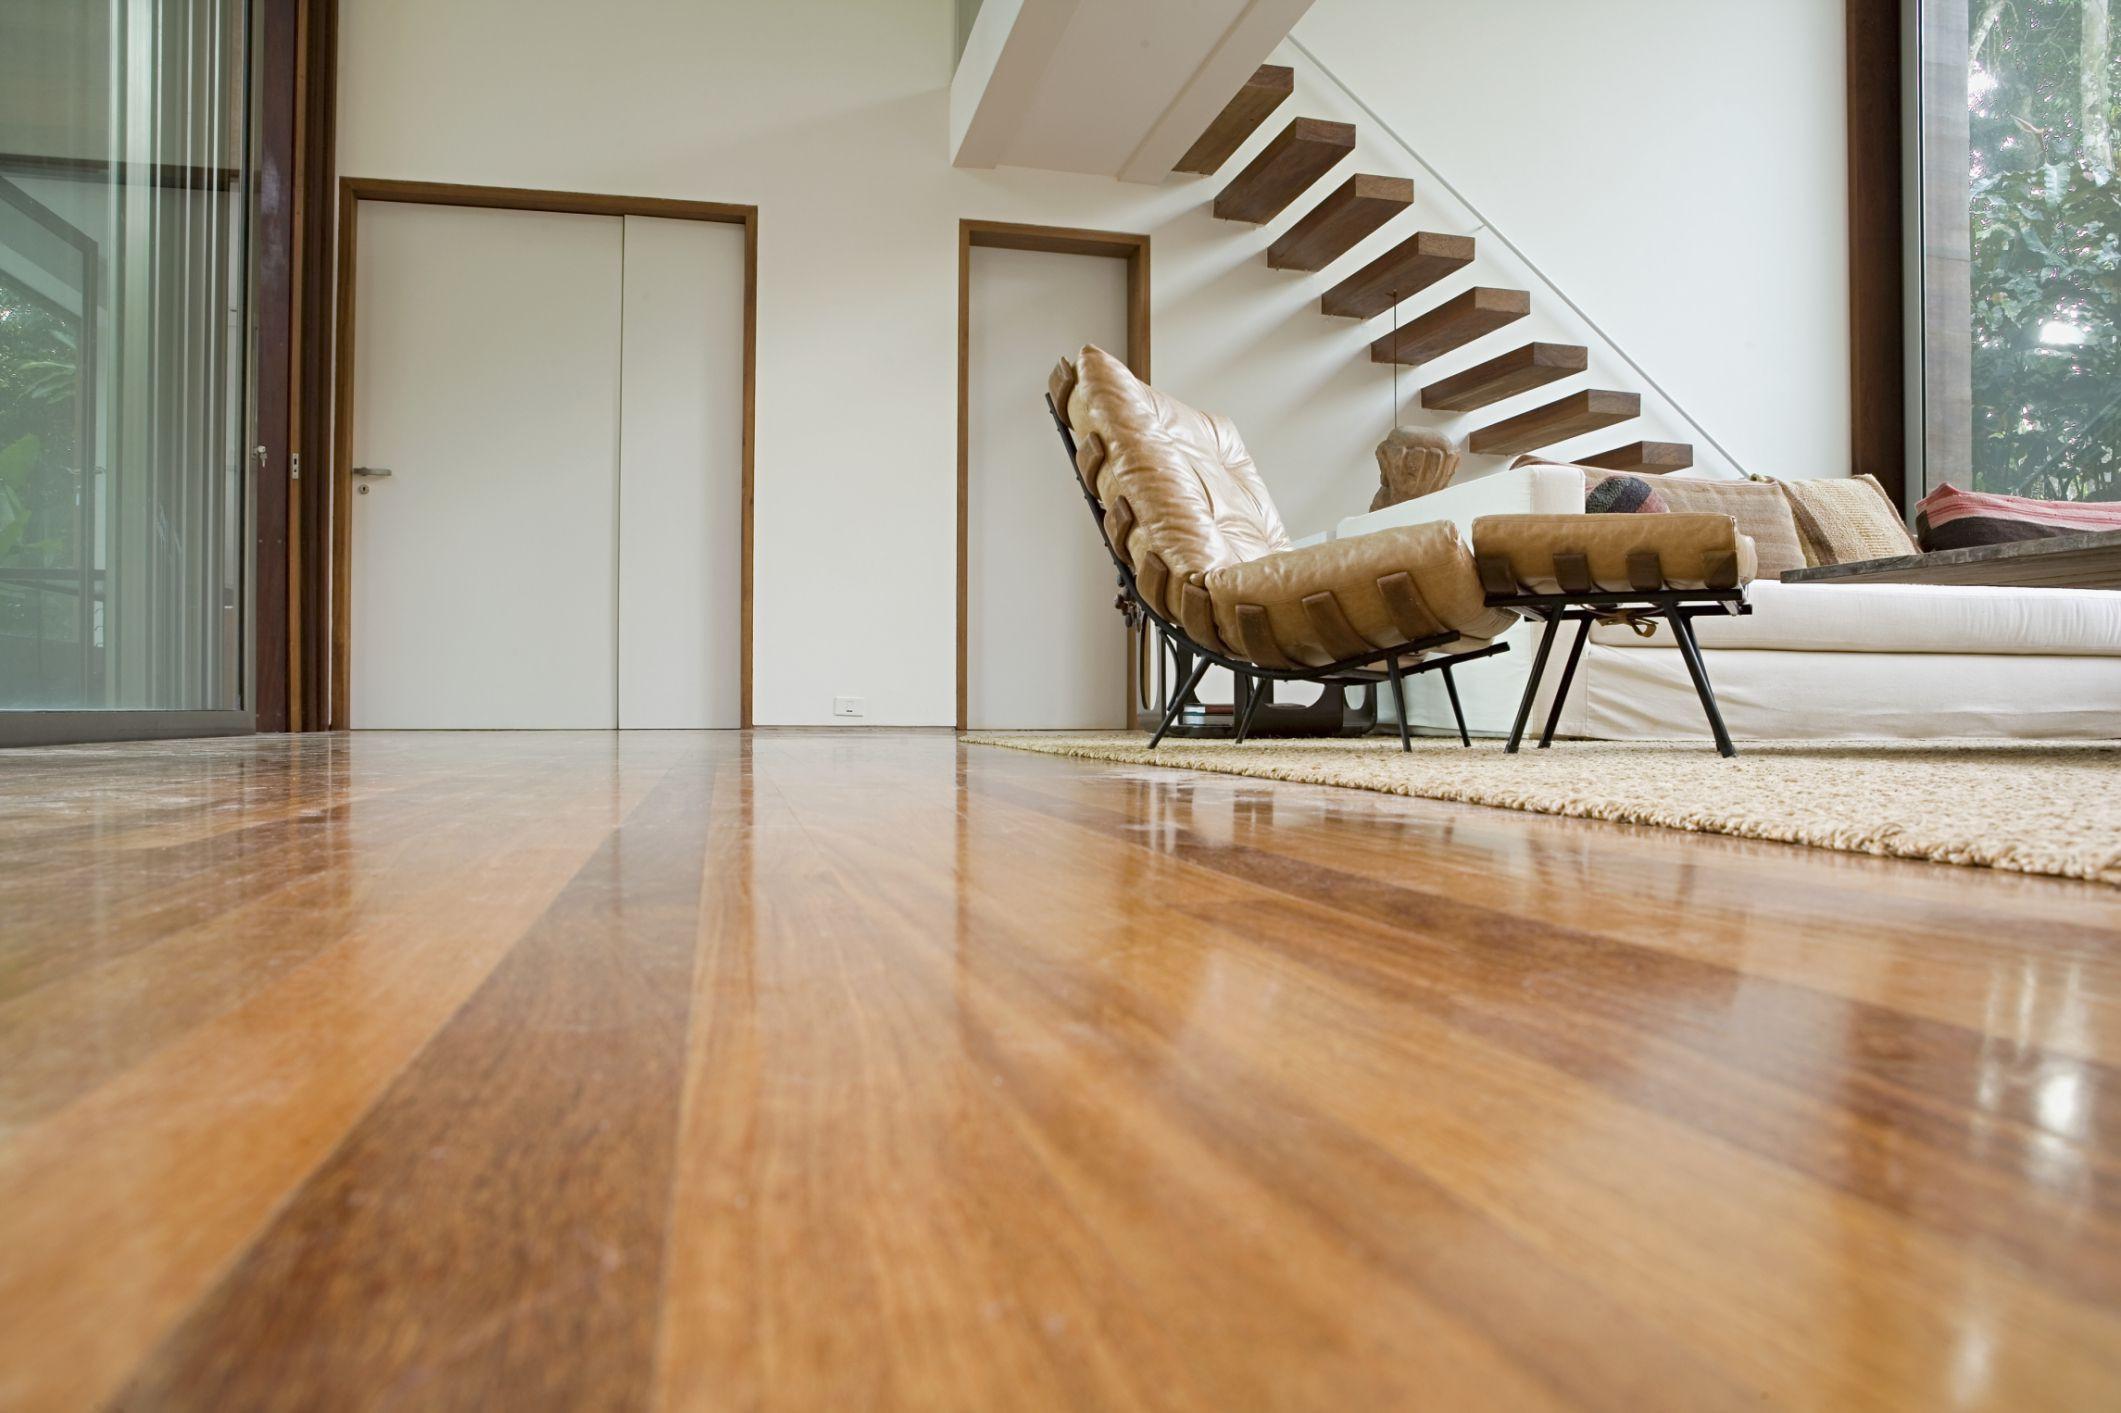 25 Best Hardwood Floor Refinishing Chicago Yelp 2021 free download hardwood floor refinishing chicago yelp of engineered wood flooring vs solid wood flooring pertaining to 200571260 001 highres 56a49dec5f9b58b7d0d7dc1e